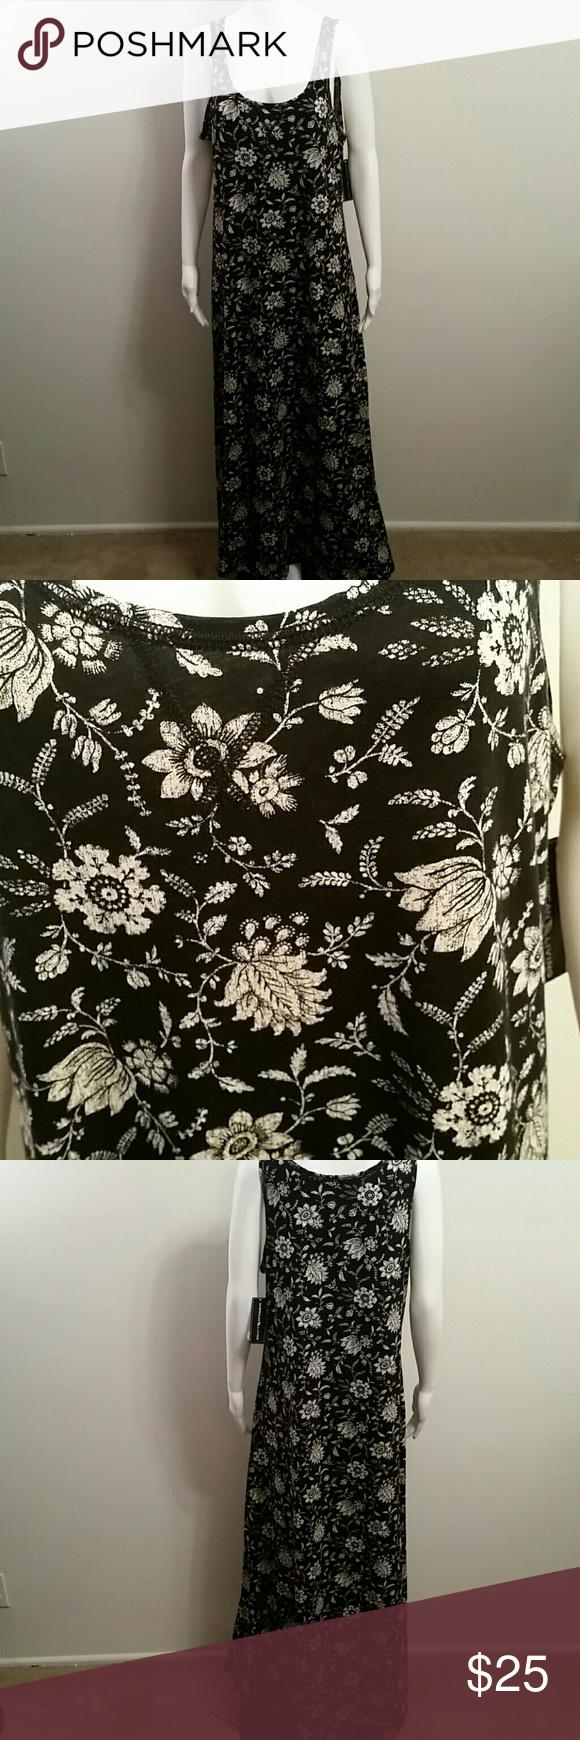 NWT American Living Black Floral Print Dress NWT American Living Black Floral Print Dress Retail  $60 American Living  Dresses Maxi